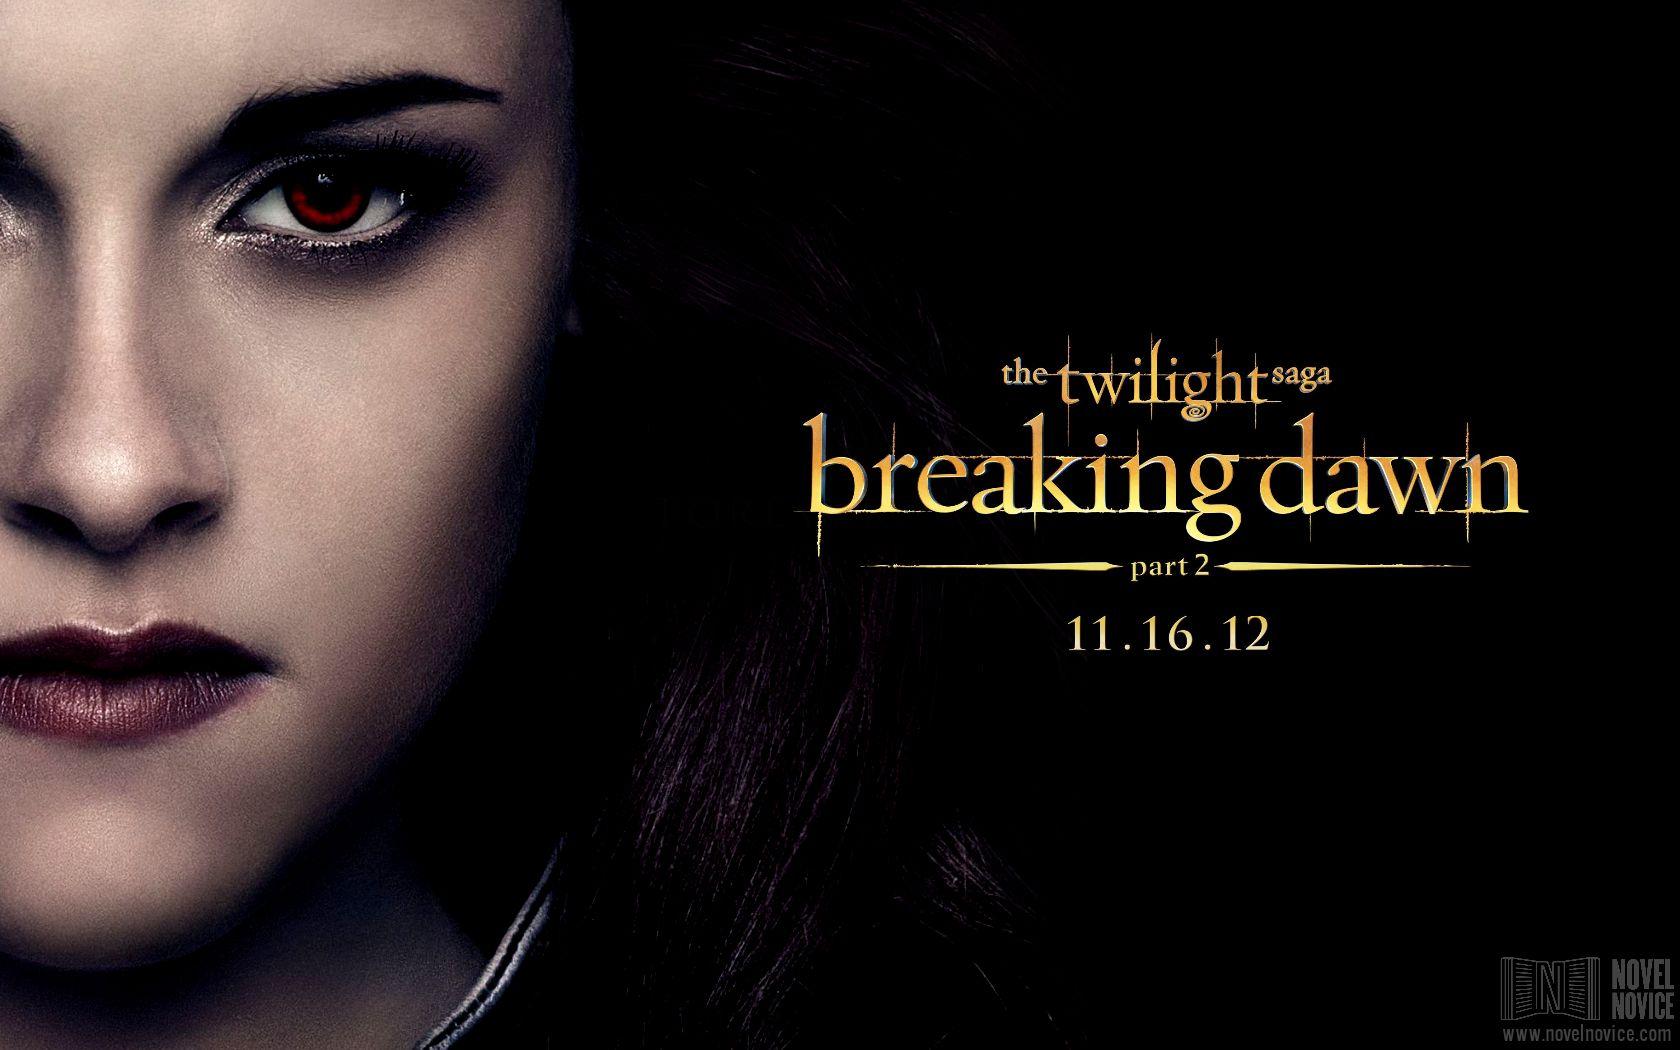 The twilight saga breaking dawn part 2 desktop - Twilight breaking dawn wallpaper ...